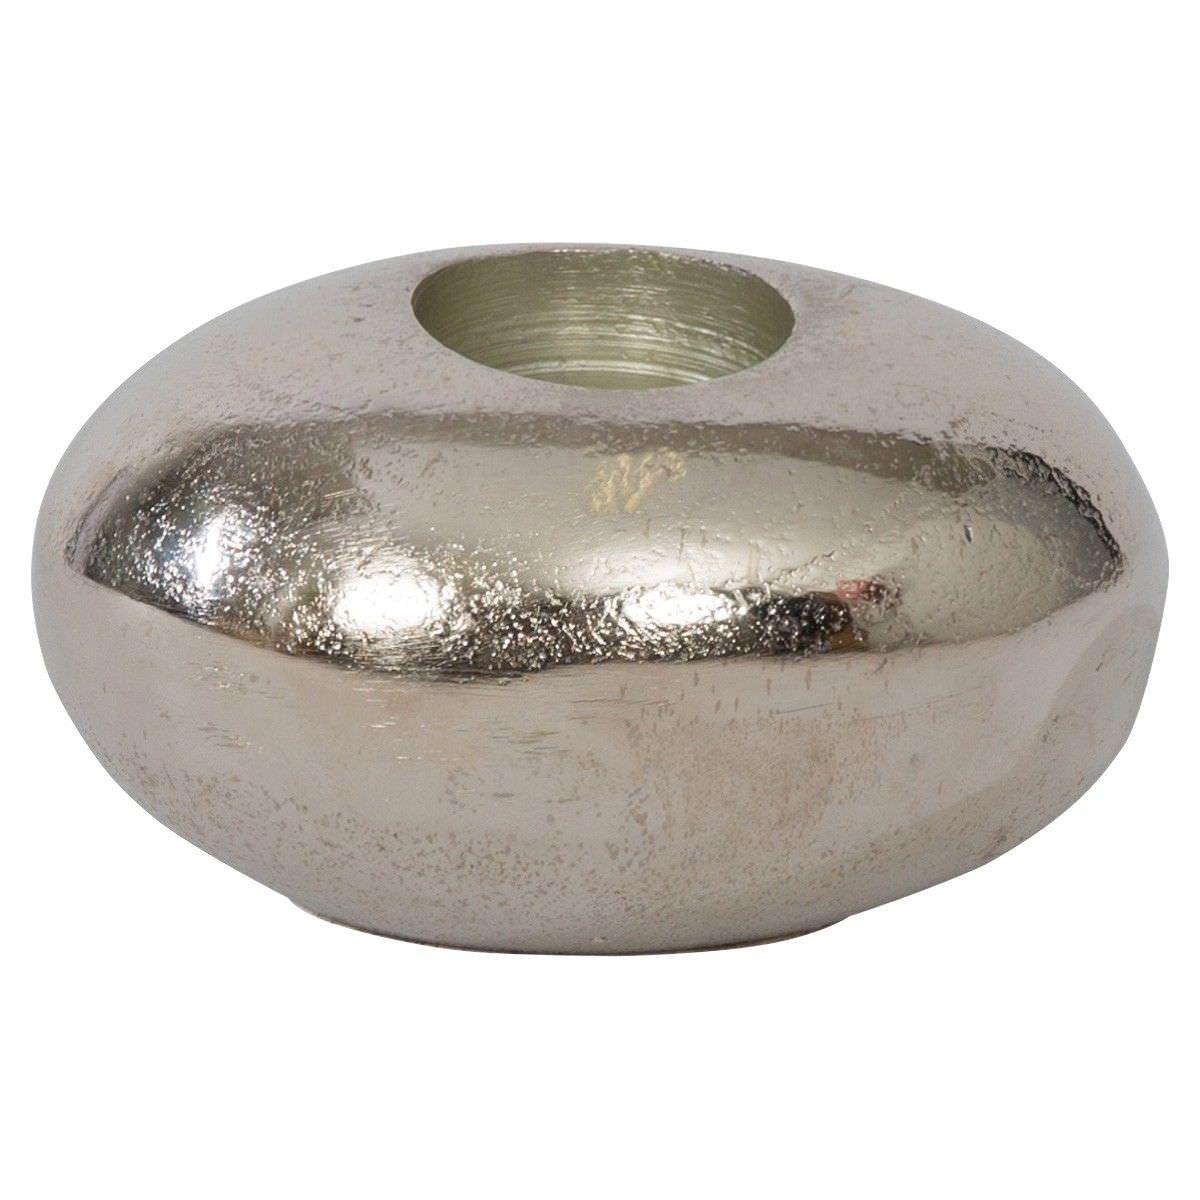 Kiora Aluminium Pebble Tealight Holder, Small, Raw Silver